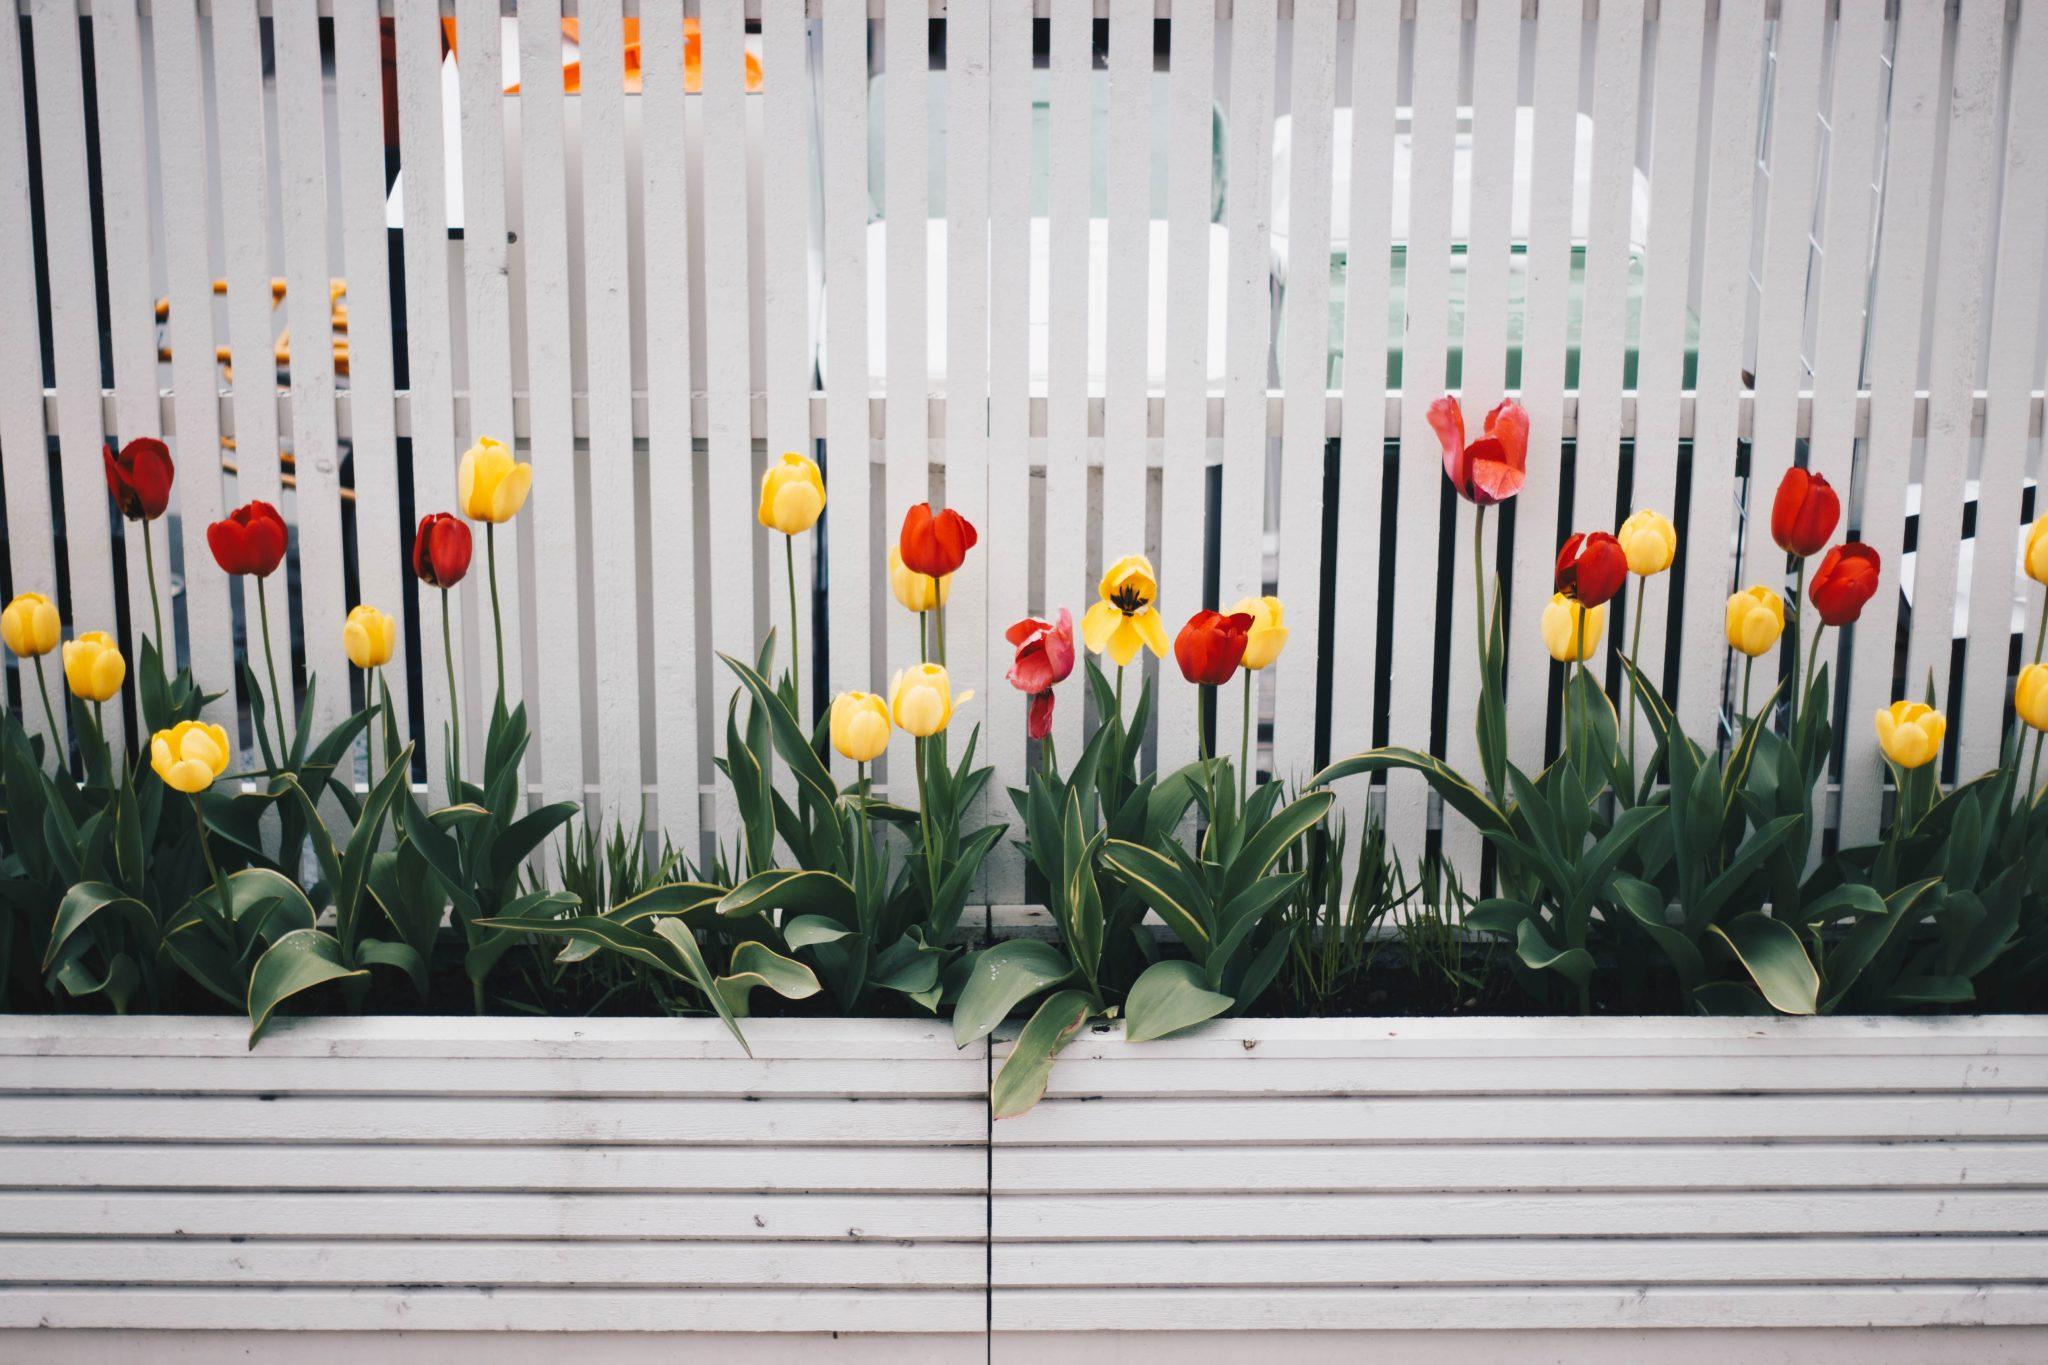 bloom-blossom-decoration-701758.jpg